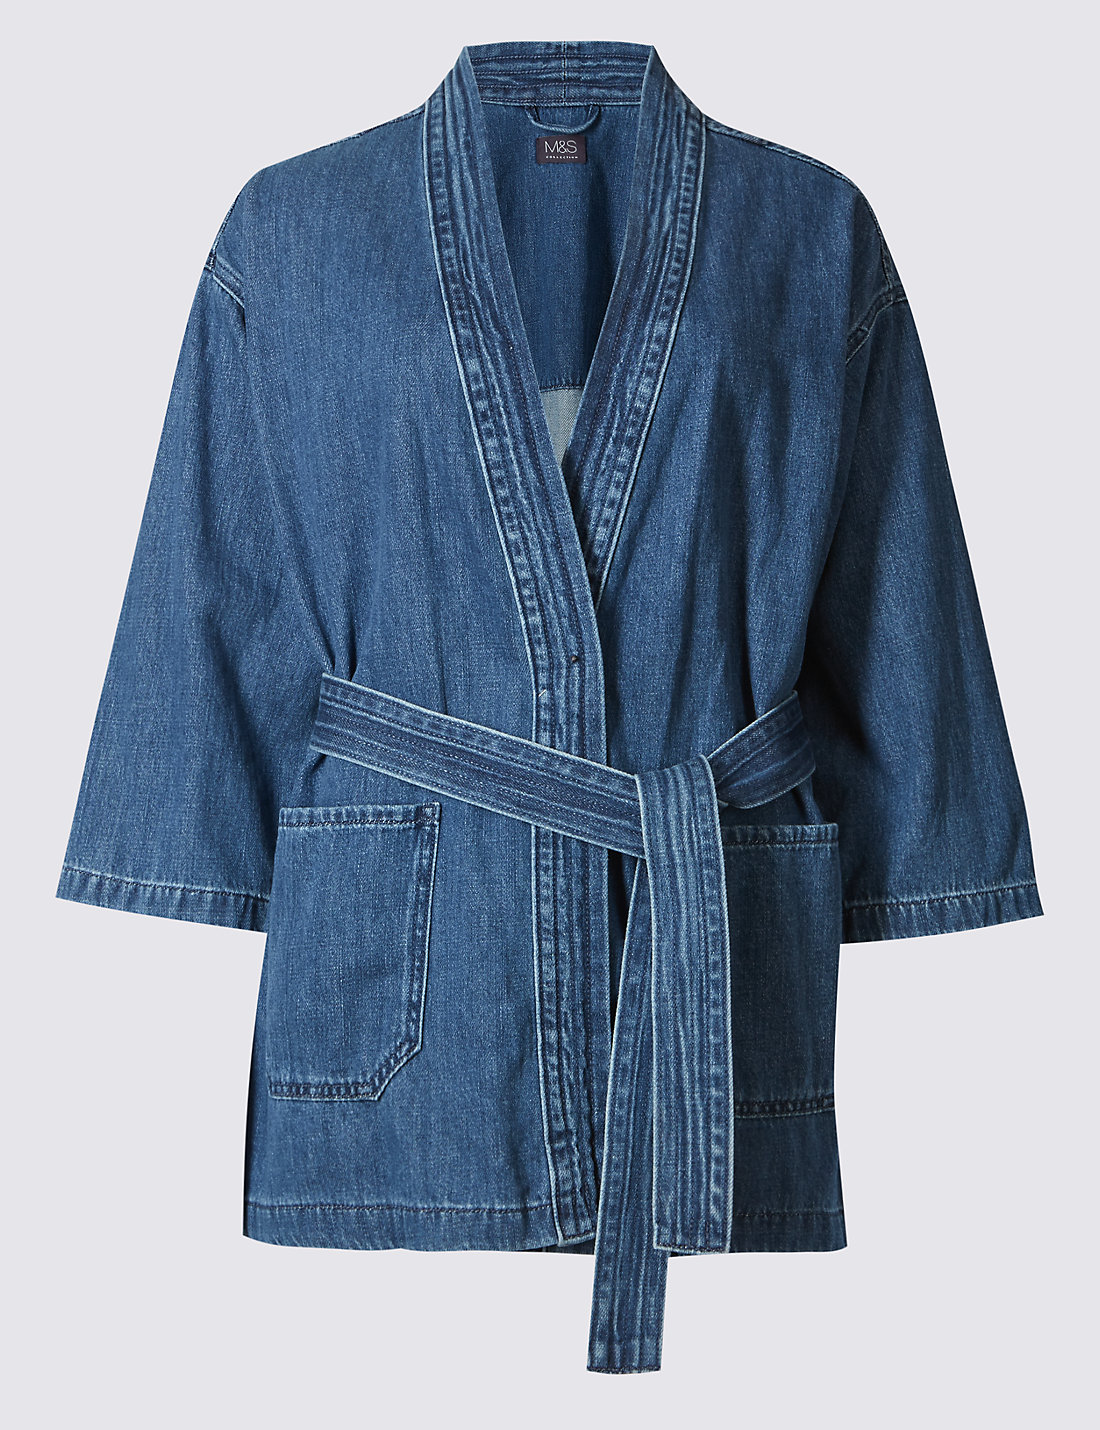 M&S denim jacket